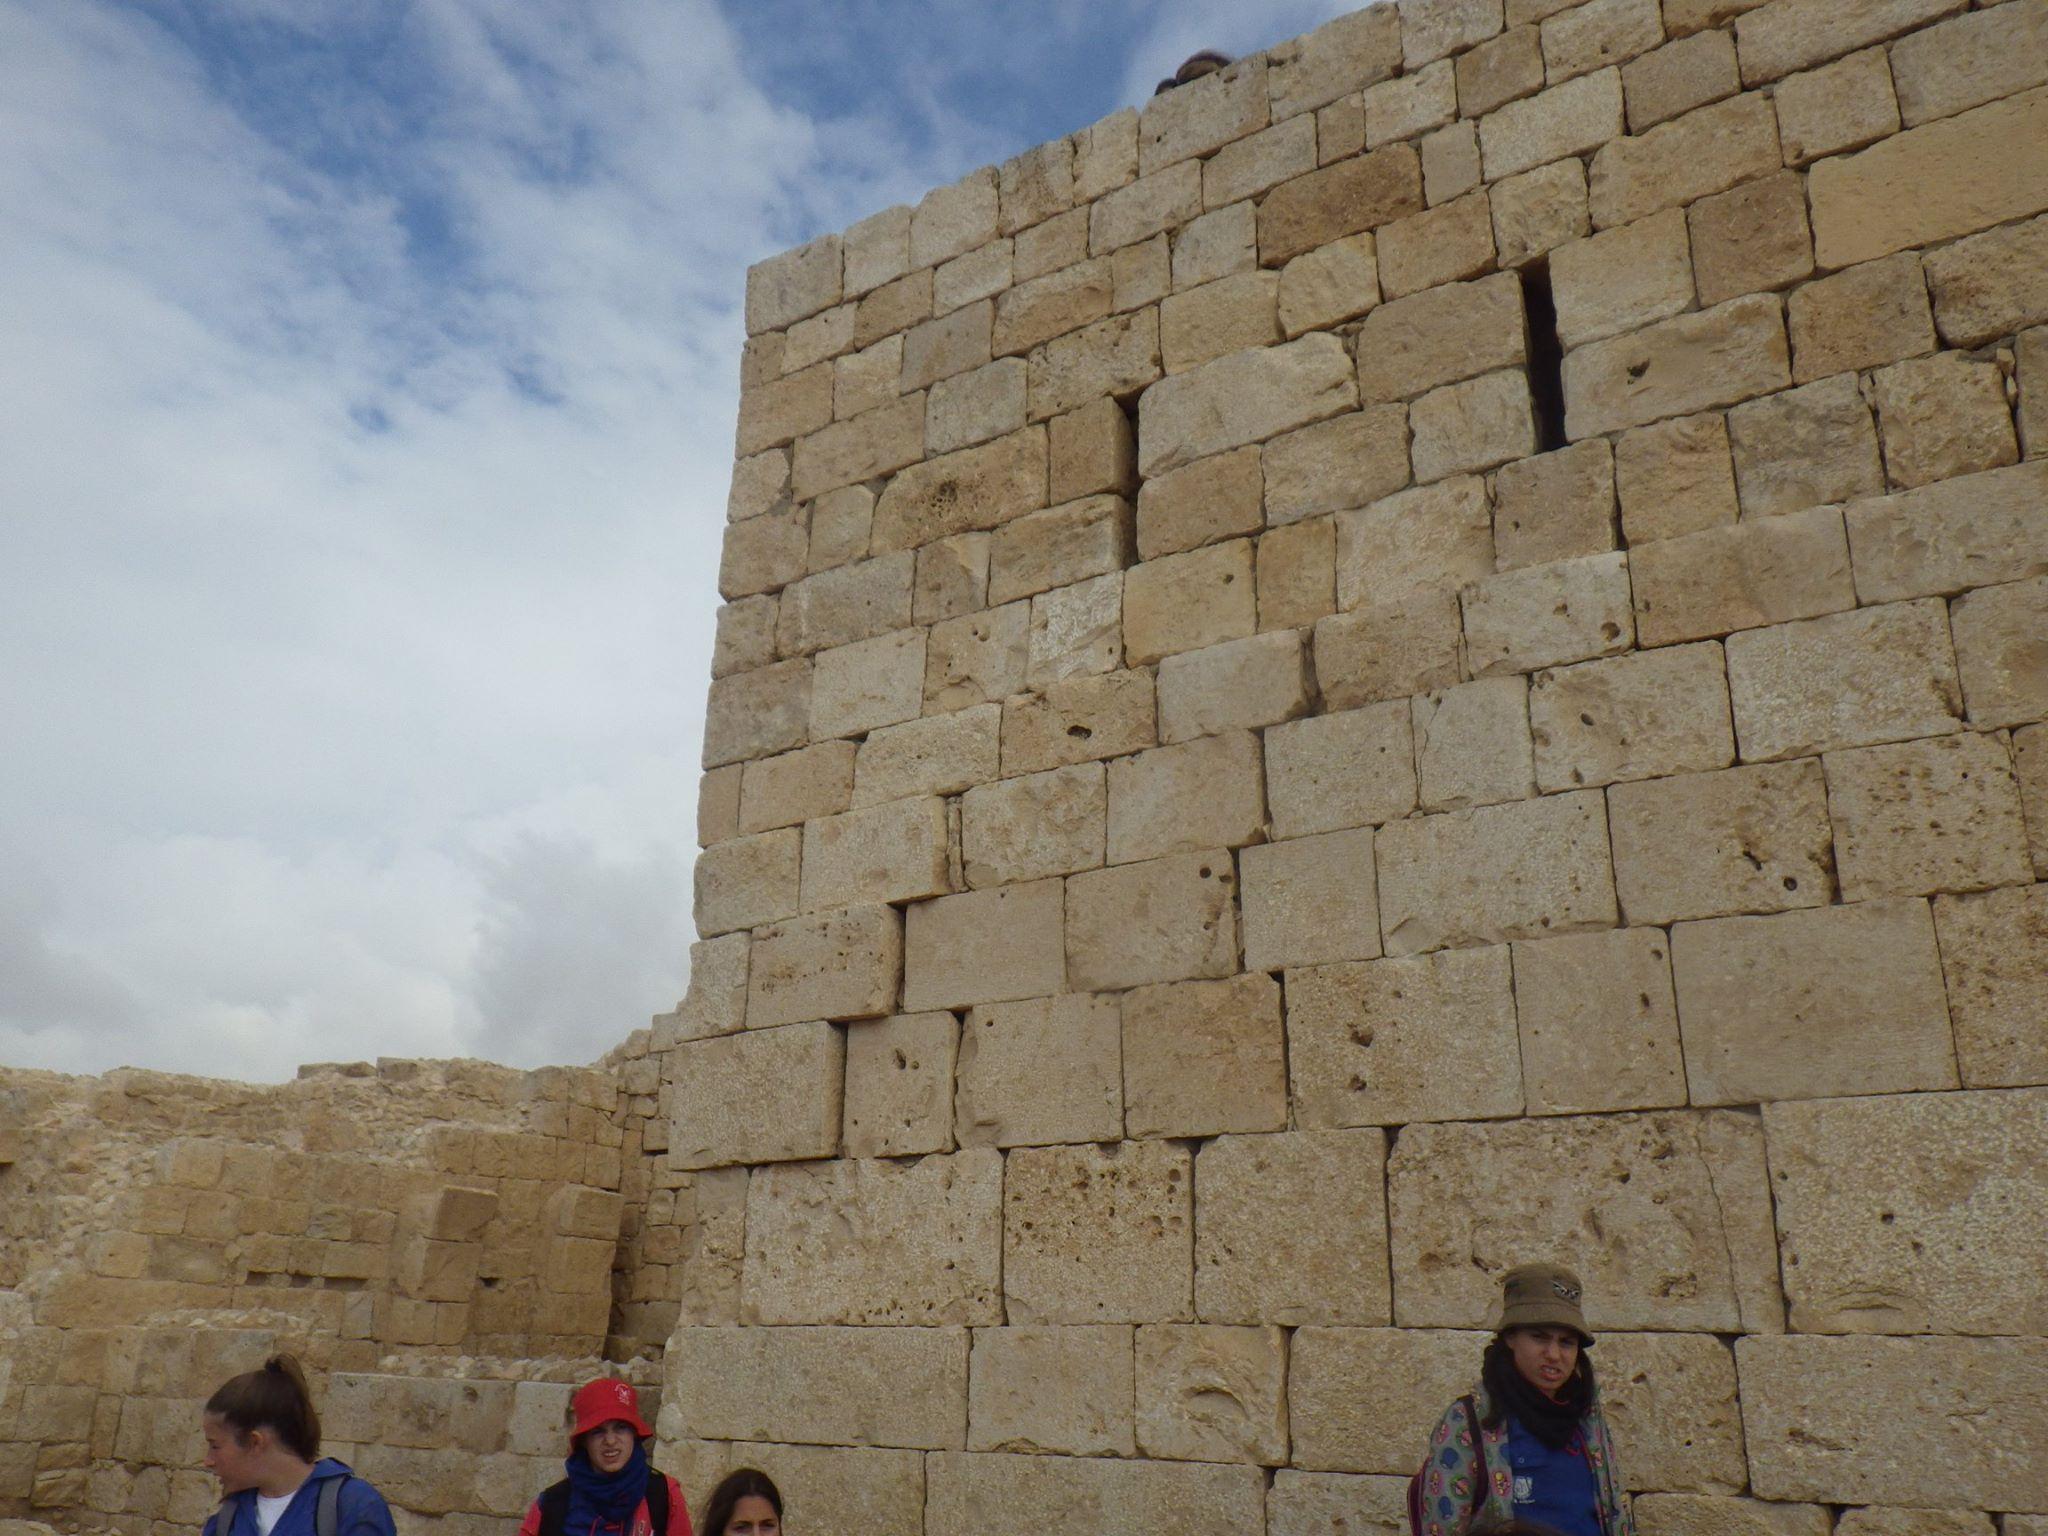 Avdat Wall Bulges